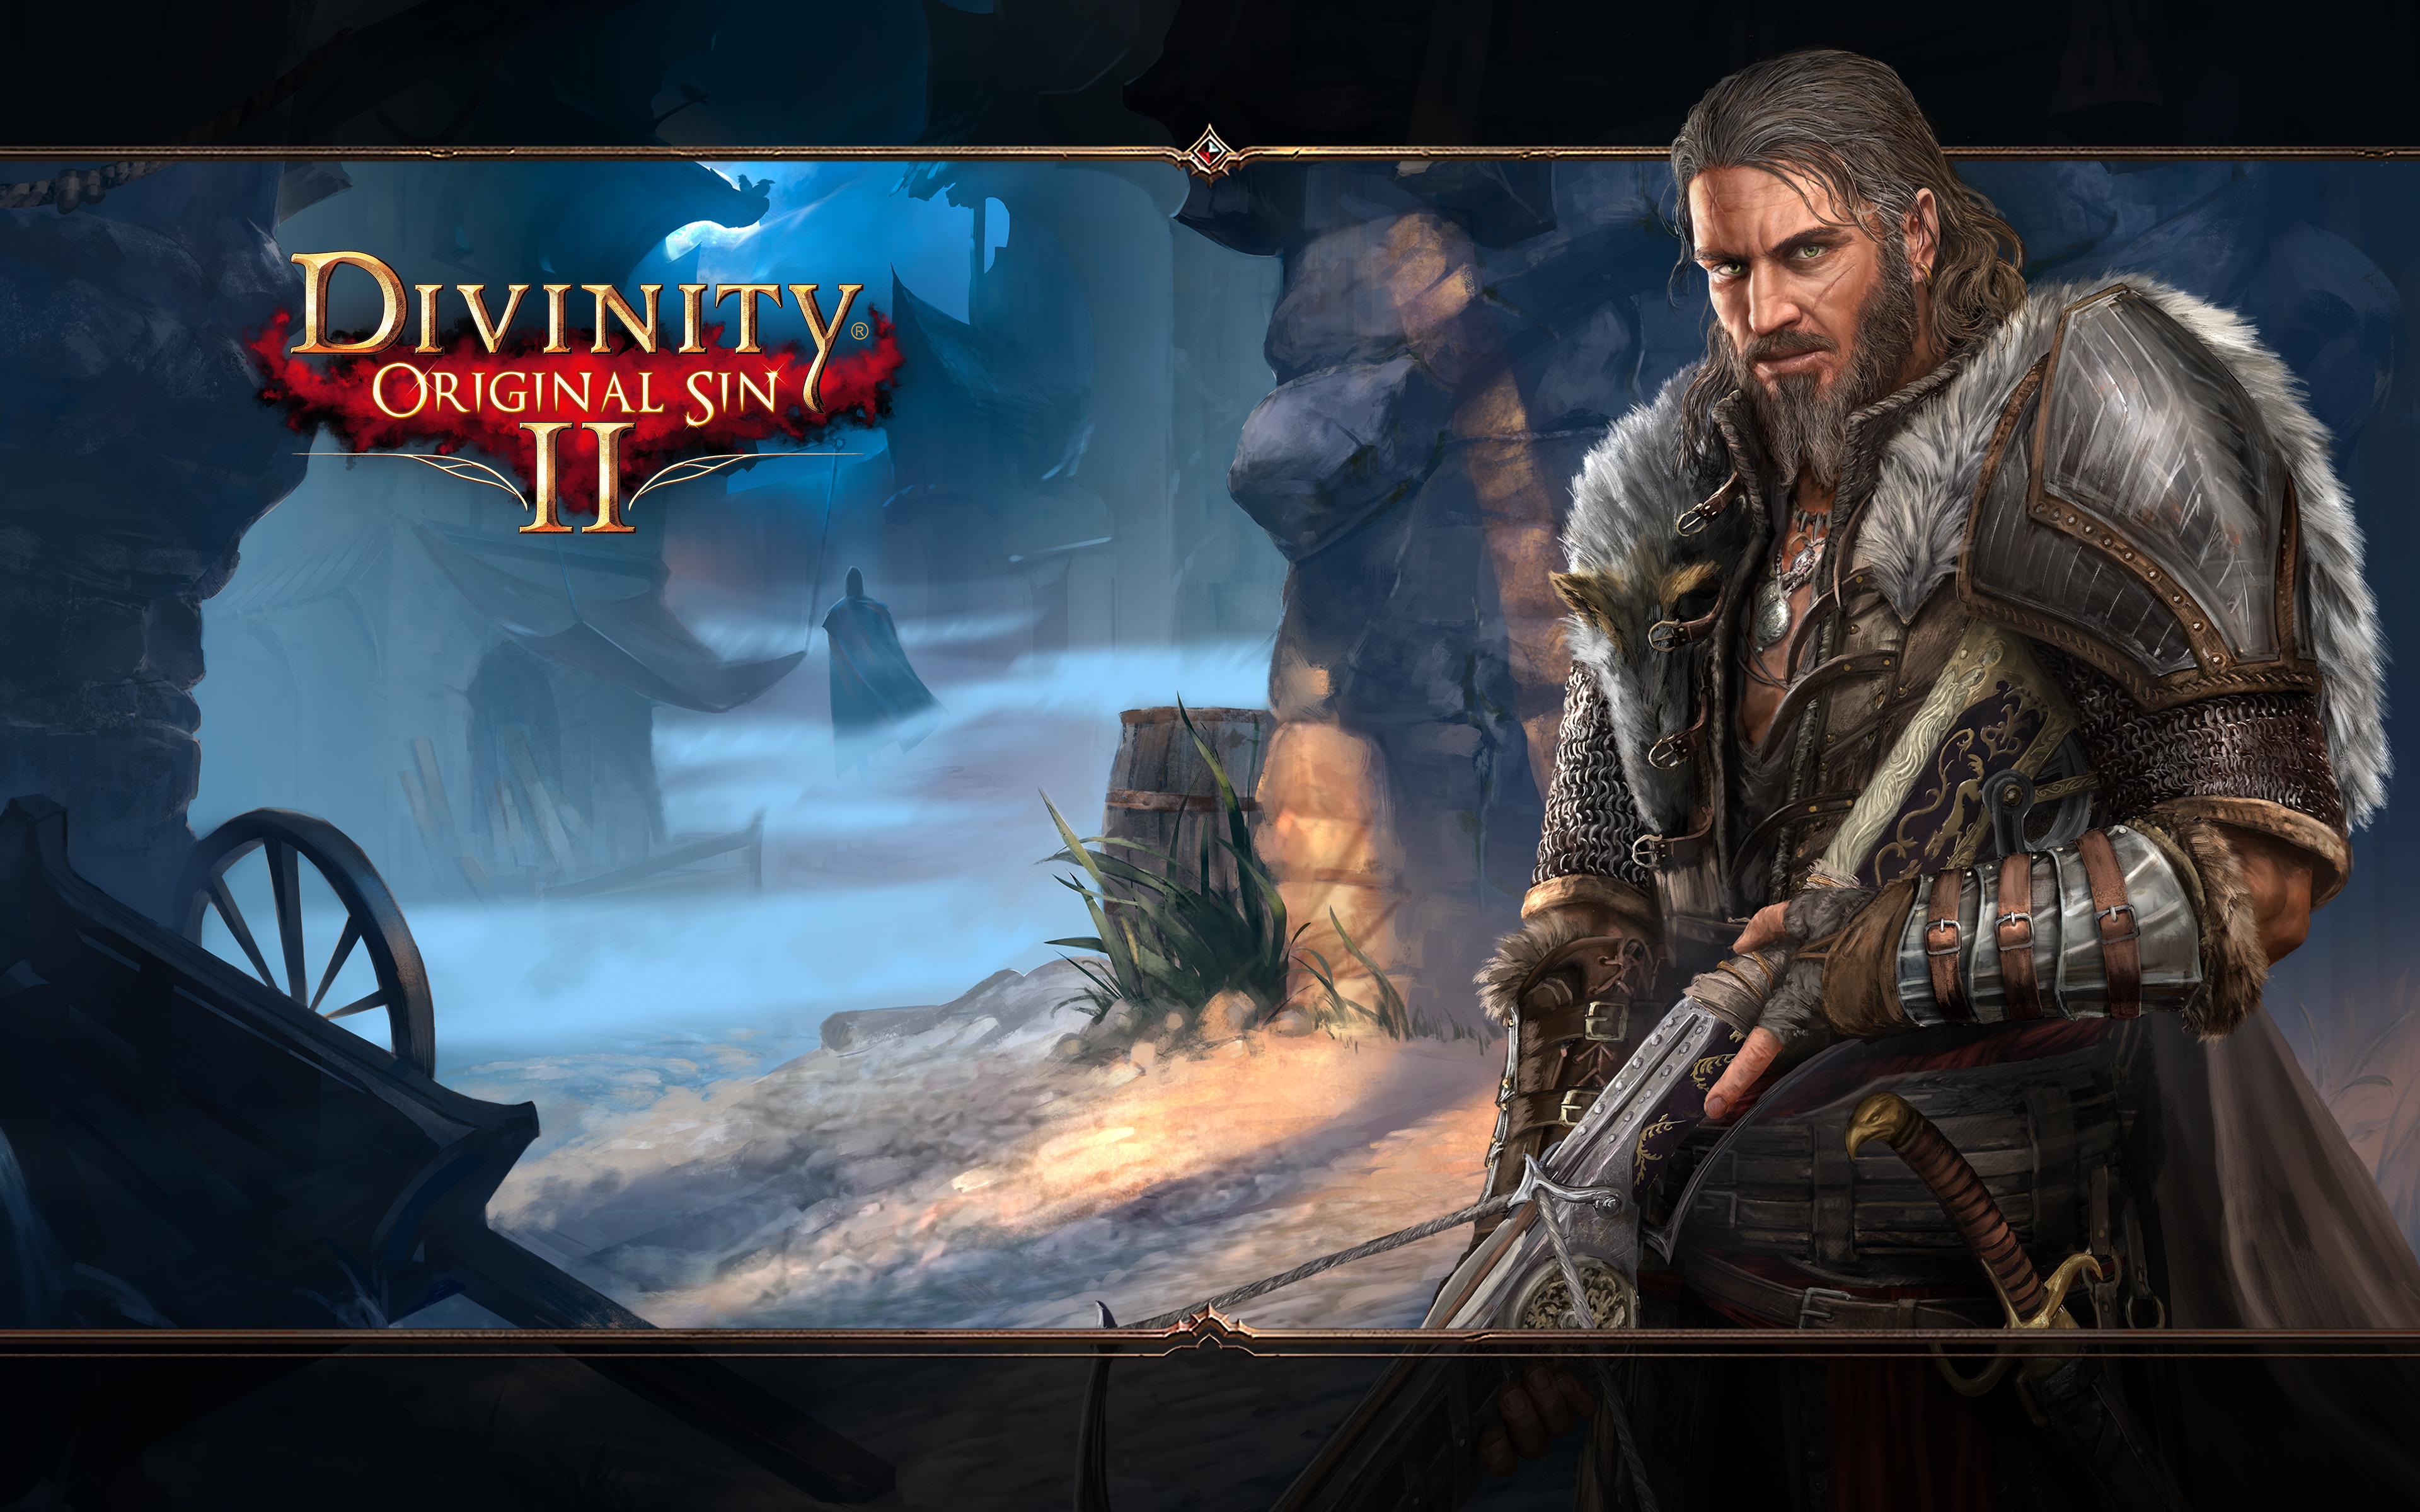 Divinity Original Sin Ii 4k Ultra Hd Wallpaper Background Image